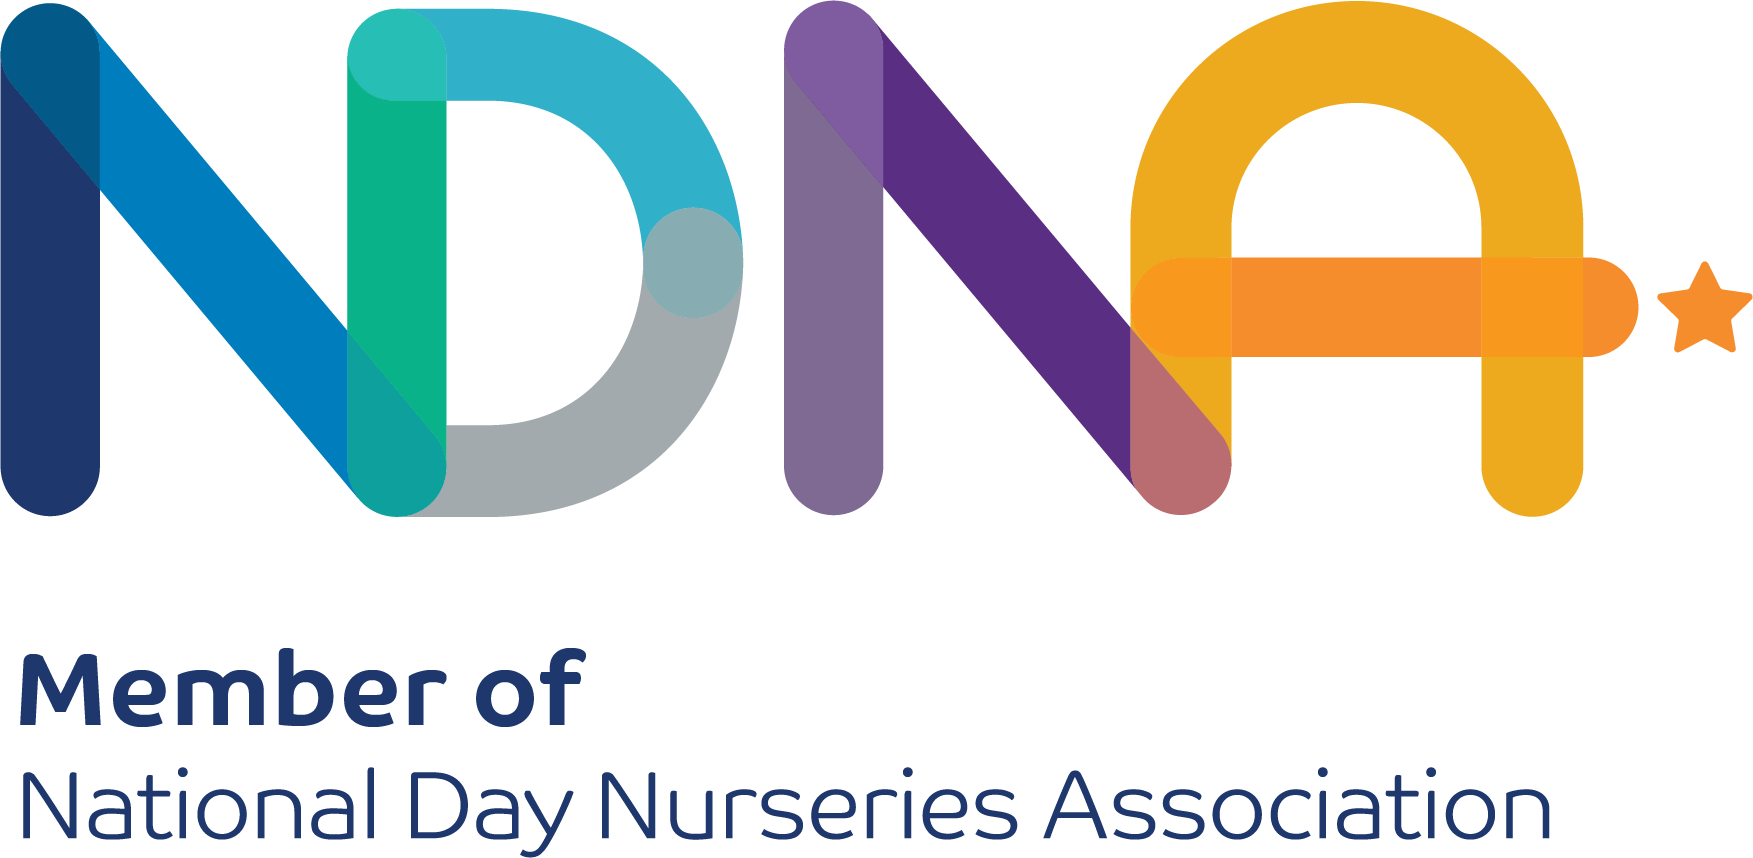 NDNA member logo